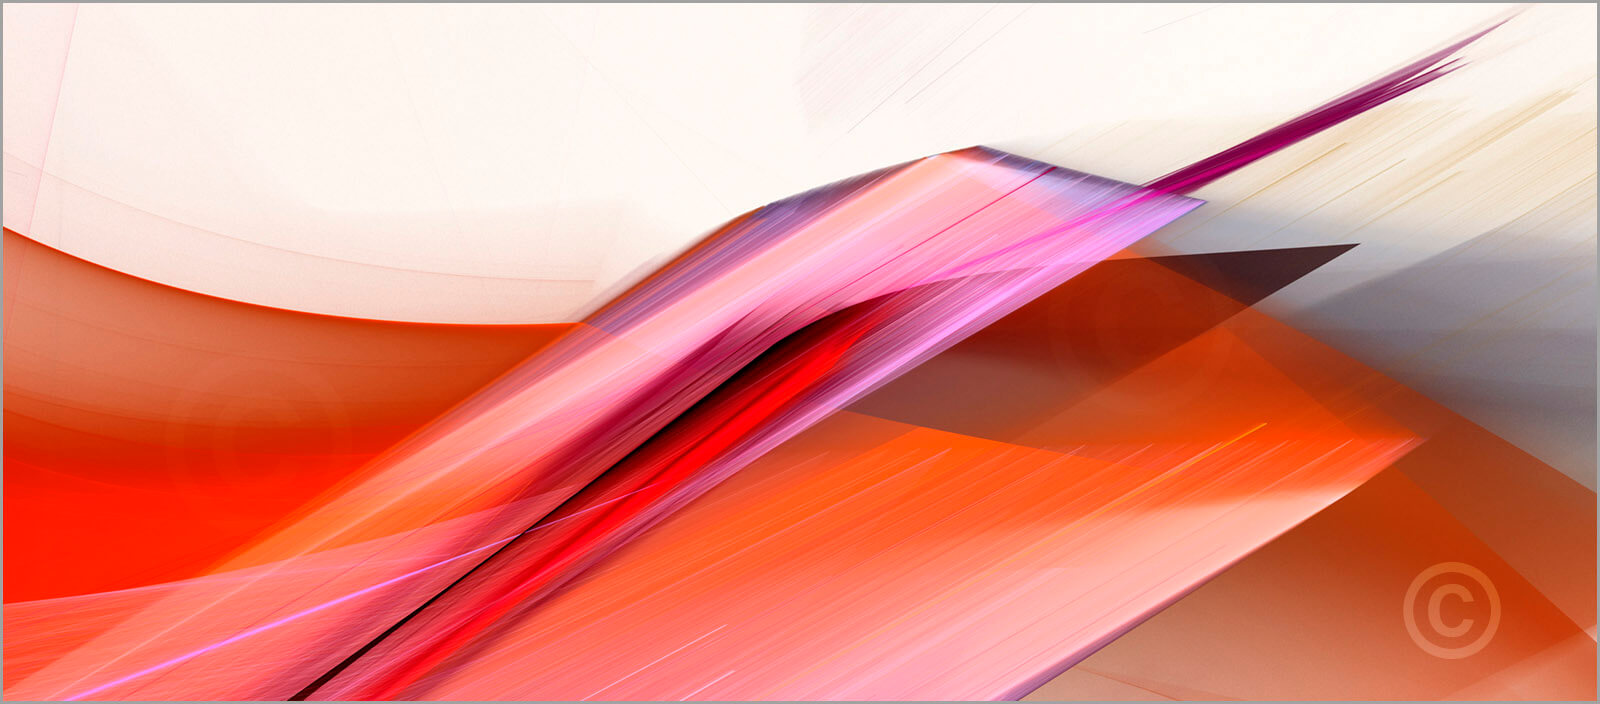 Colorshapes_F2_9859_XL